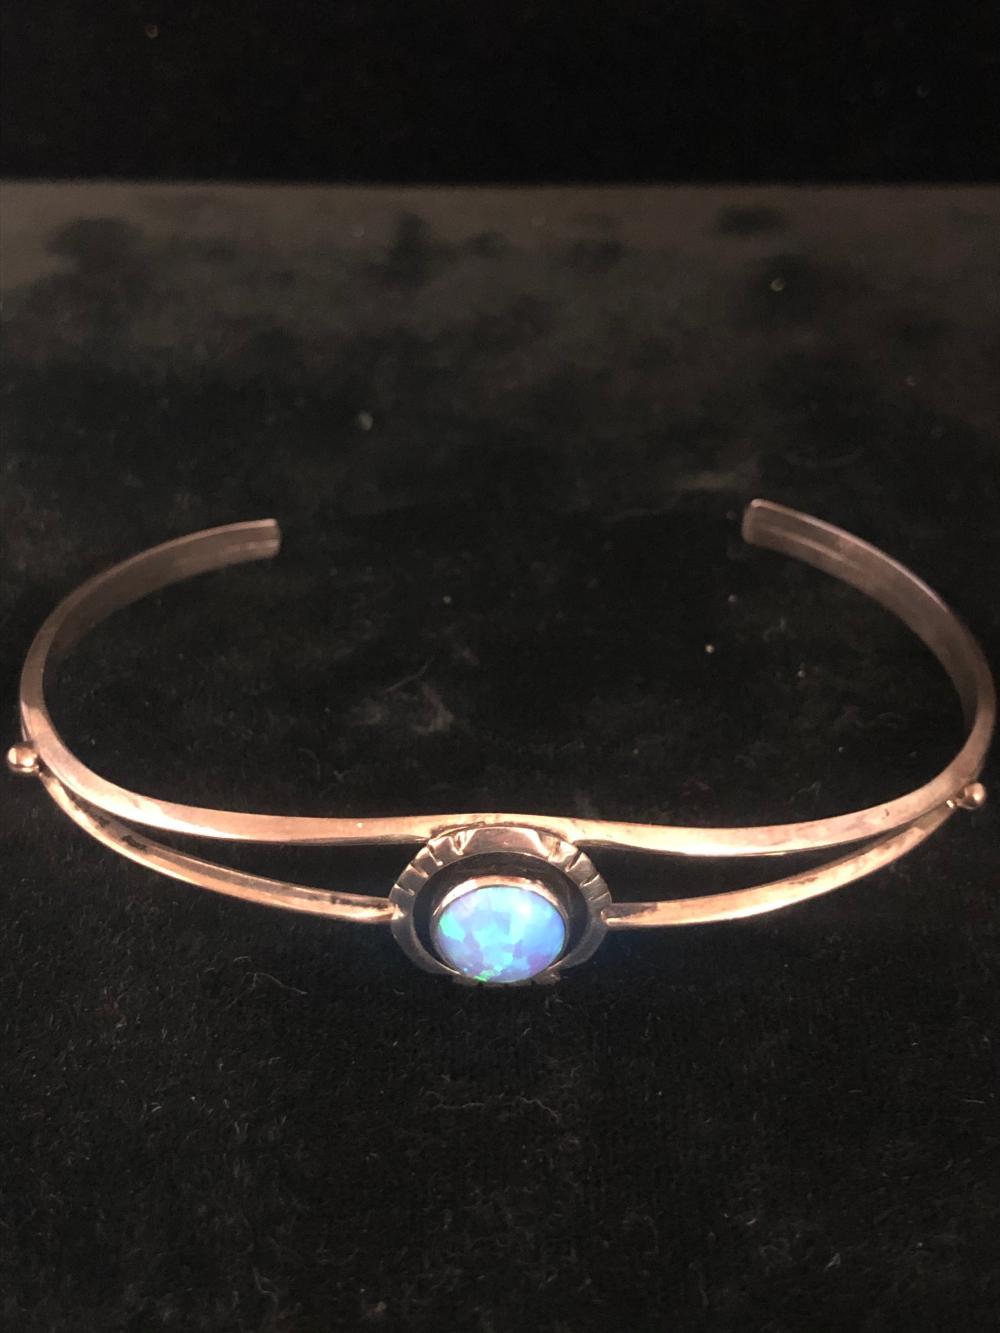 Blue cultured opal stone sterling silver cuff bracelet